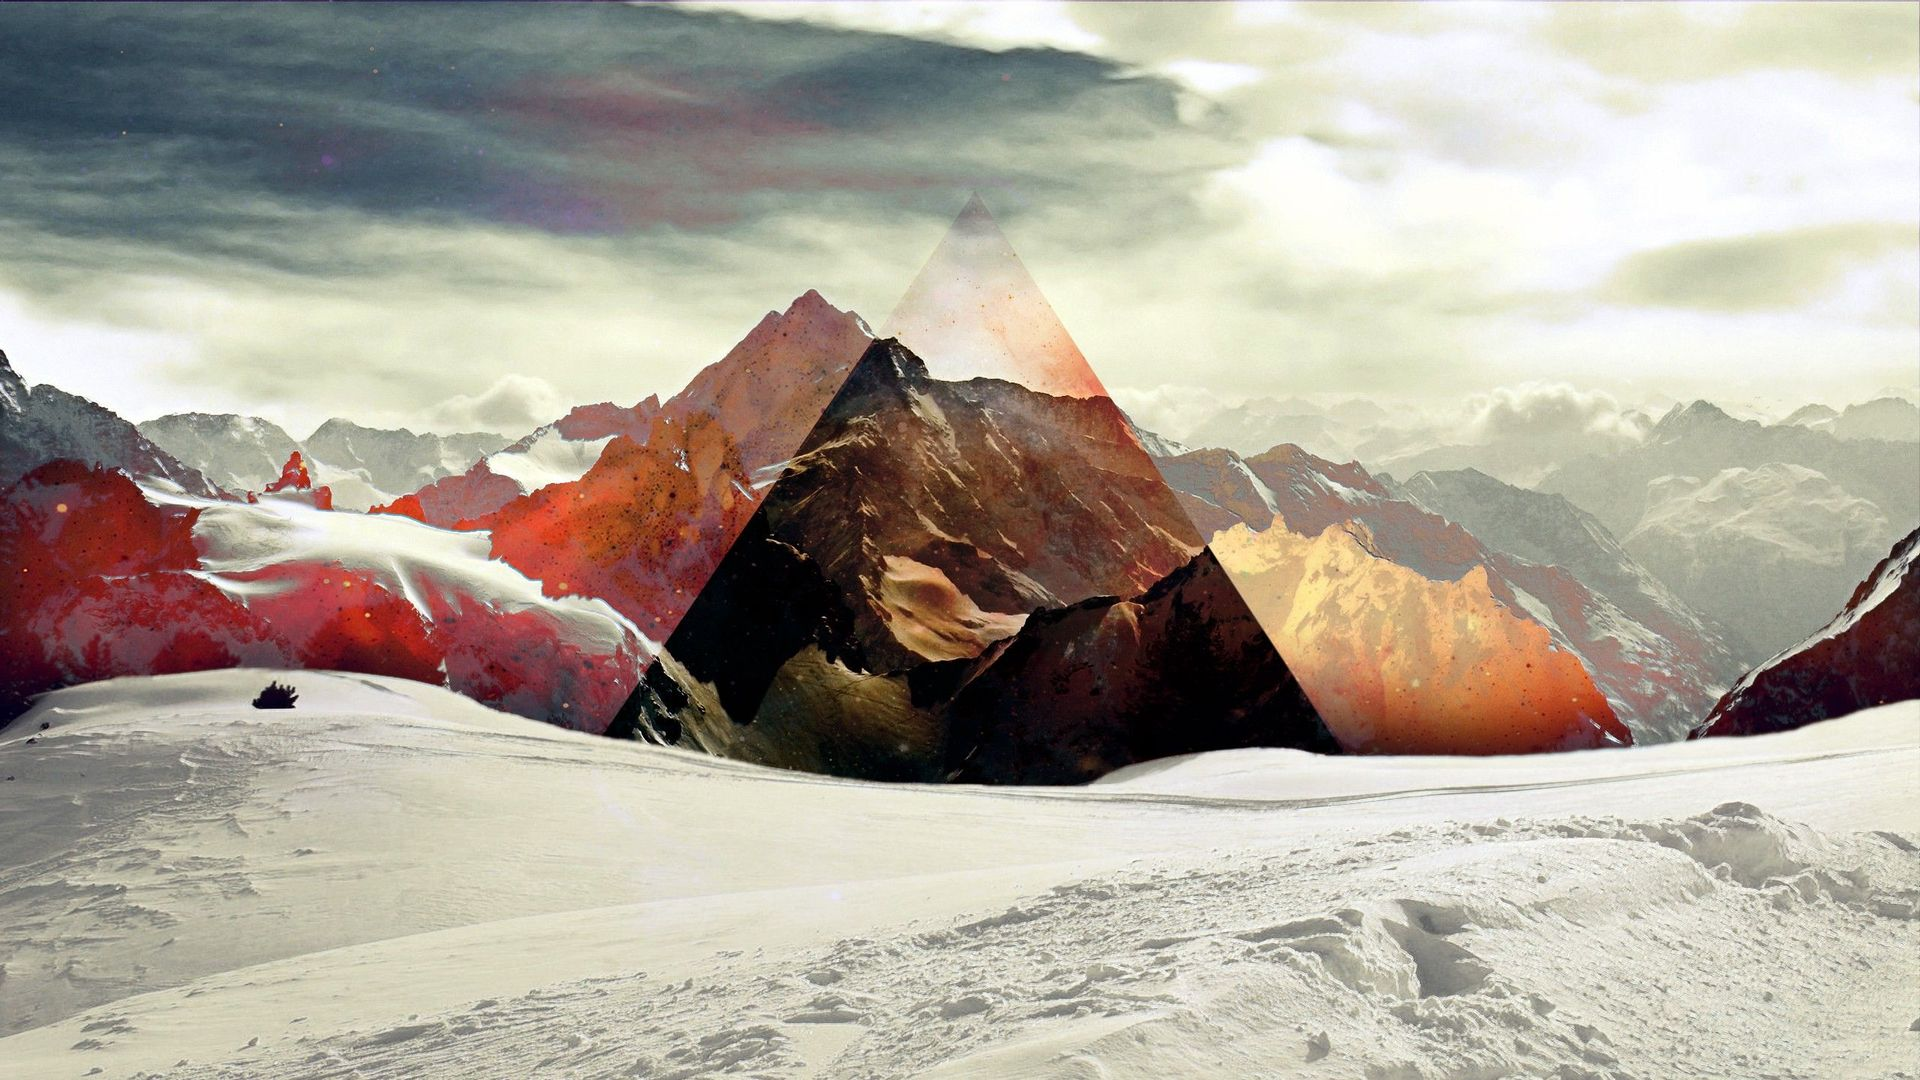 triangle-over-mountains-digital-art-hd-wallpaper-1920x1080-2145.jpg